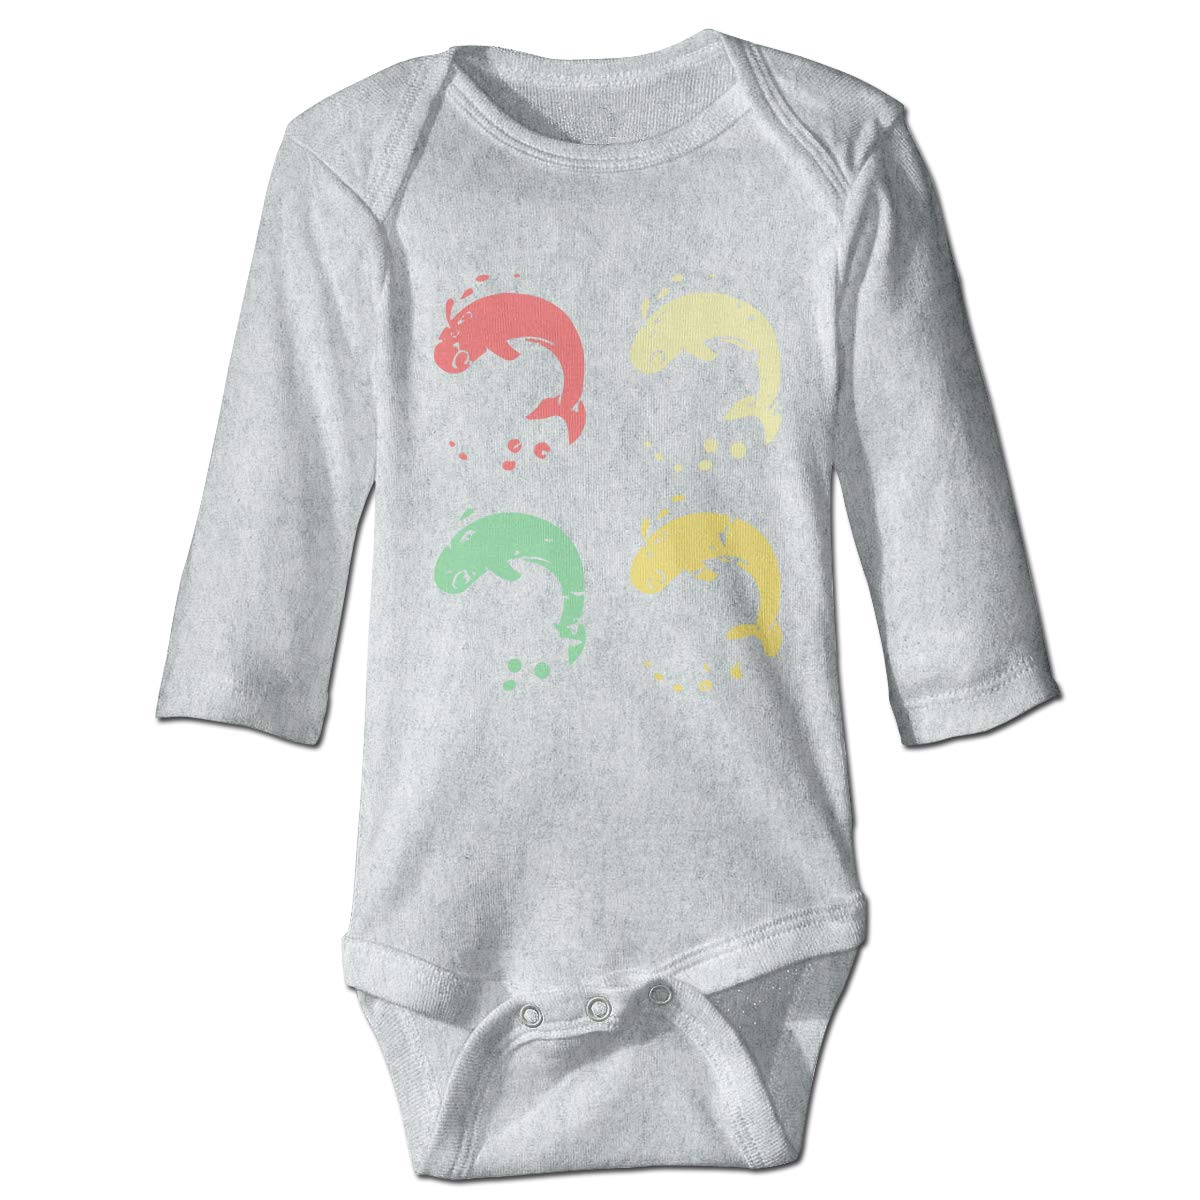 Infant Baby Girls Long Sleeve Jumpsuit Romper 4 Vintage Retro Whales Unisex Button Playsuit Outfit Clothes